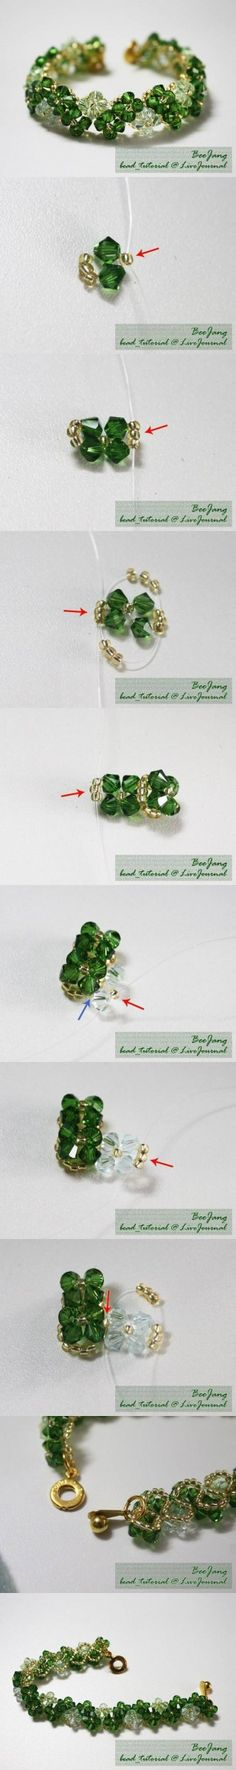 DIY Transparent Beads Bracelet DIY Projects